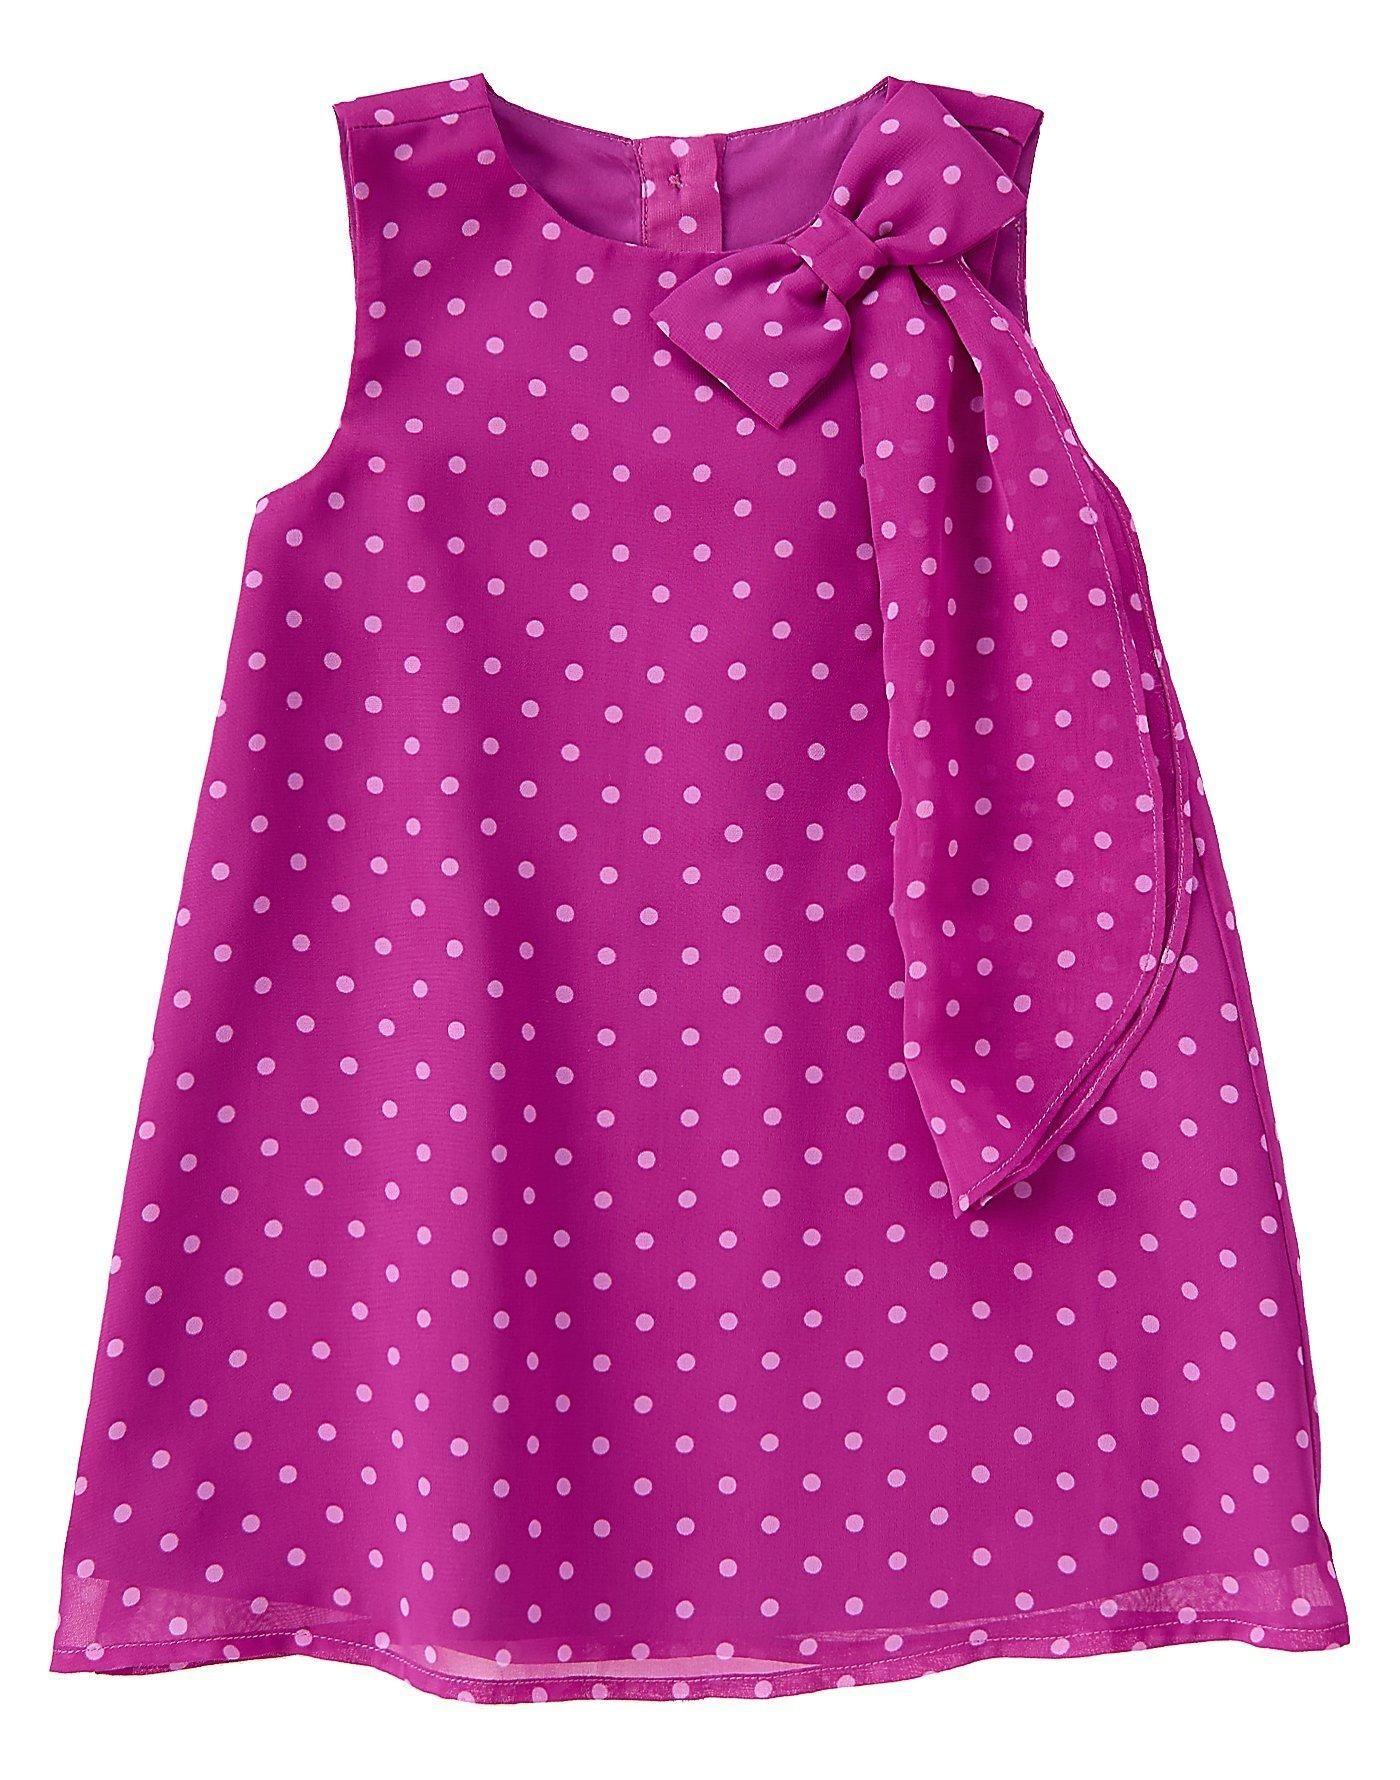 Dot dress vestidos ni a pinterest vestidos para ni as vestidos y vestido infantil - Monalisa moda infantil ...